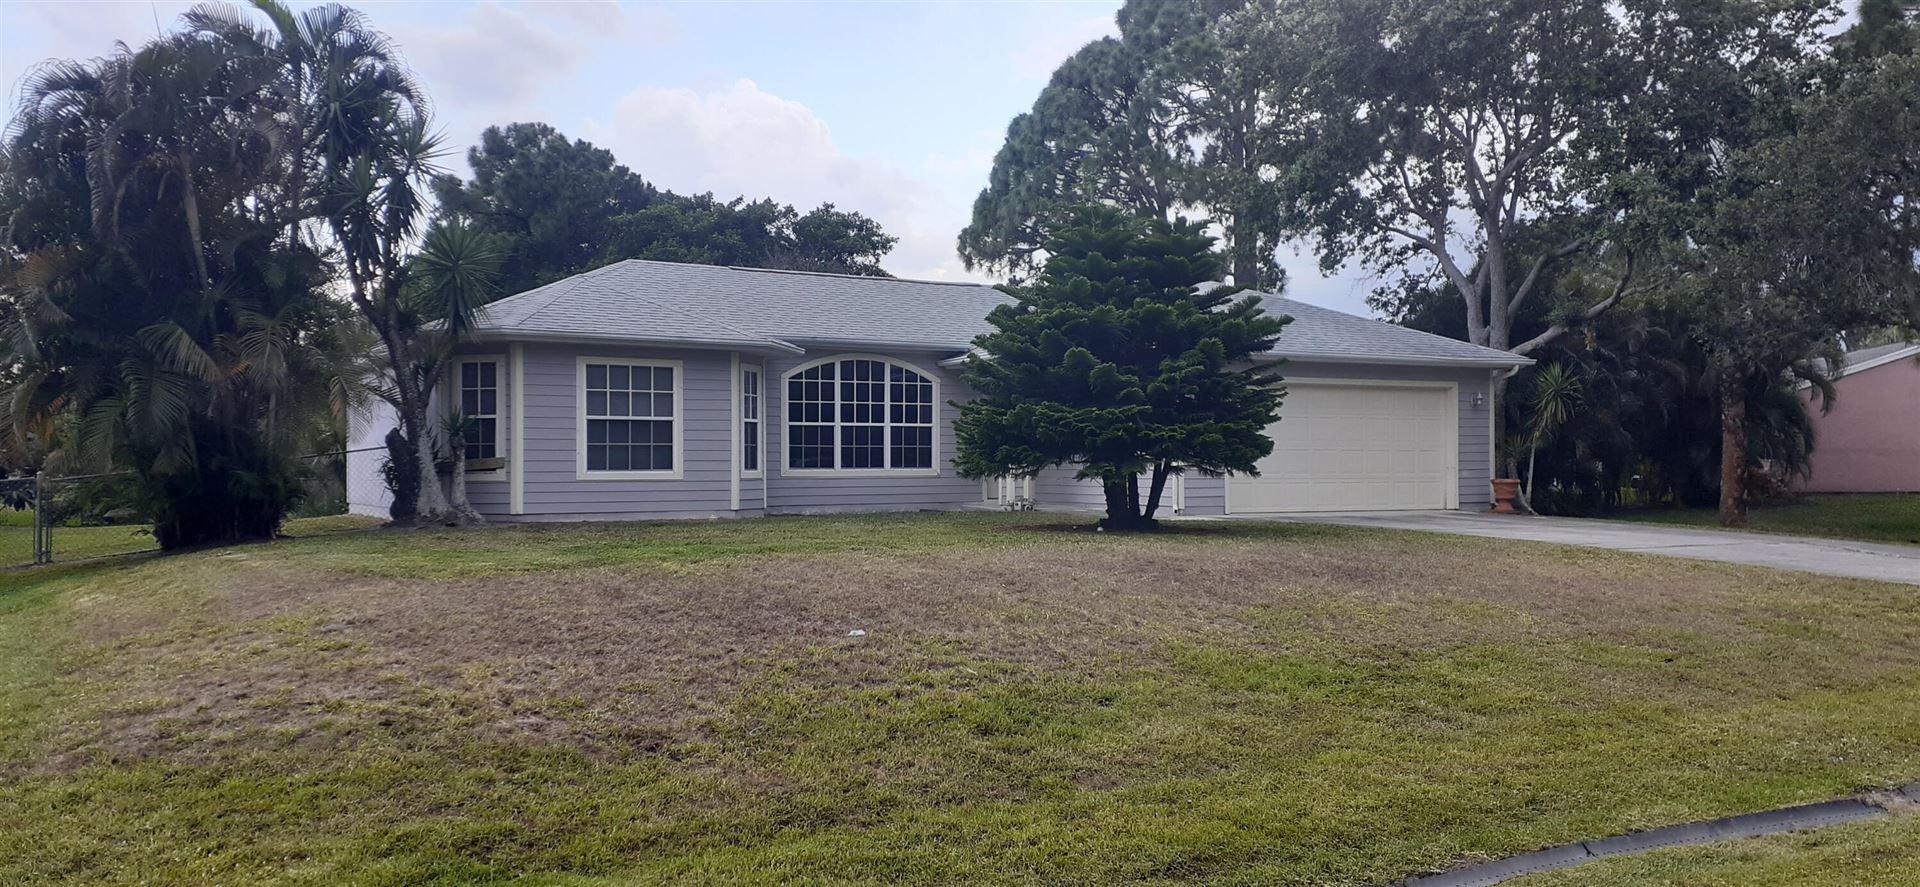 1150 SW Alesio Lane, Port Saint Lucie, FL 34953 - MLS#: RX-10712981